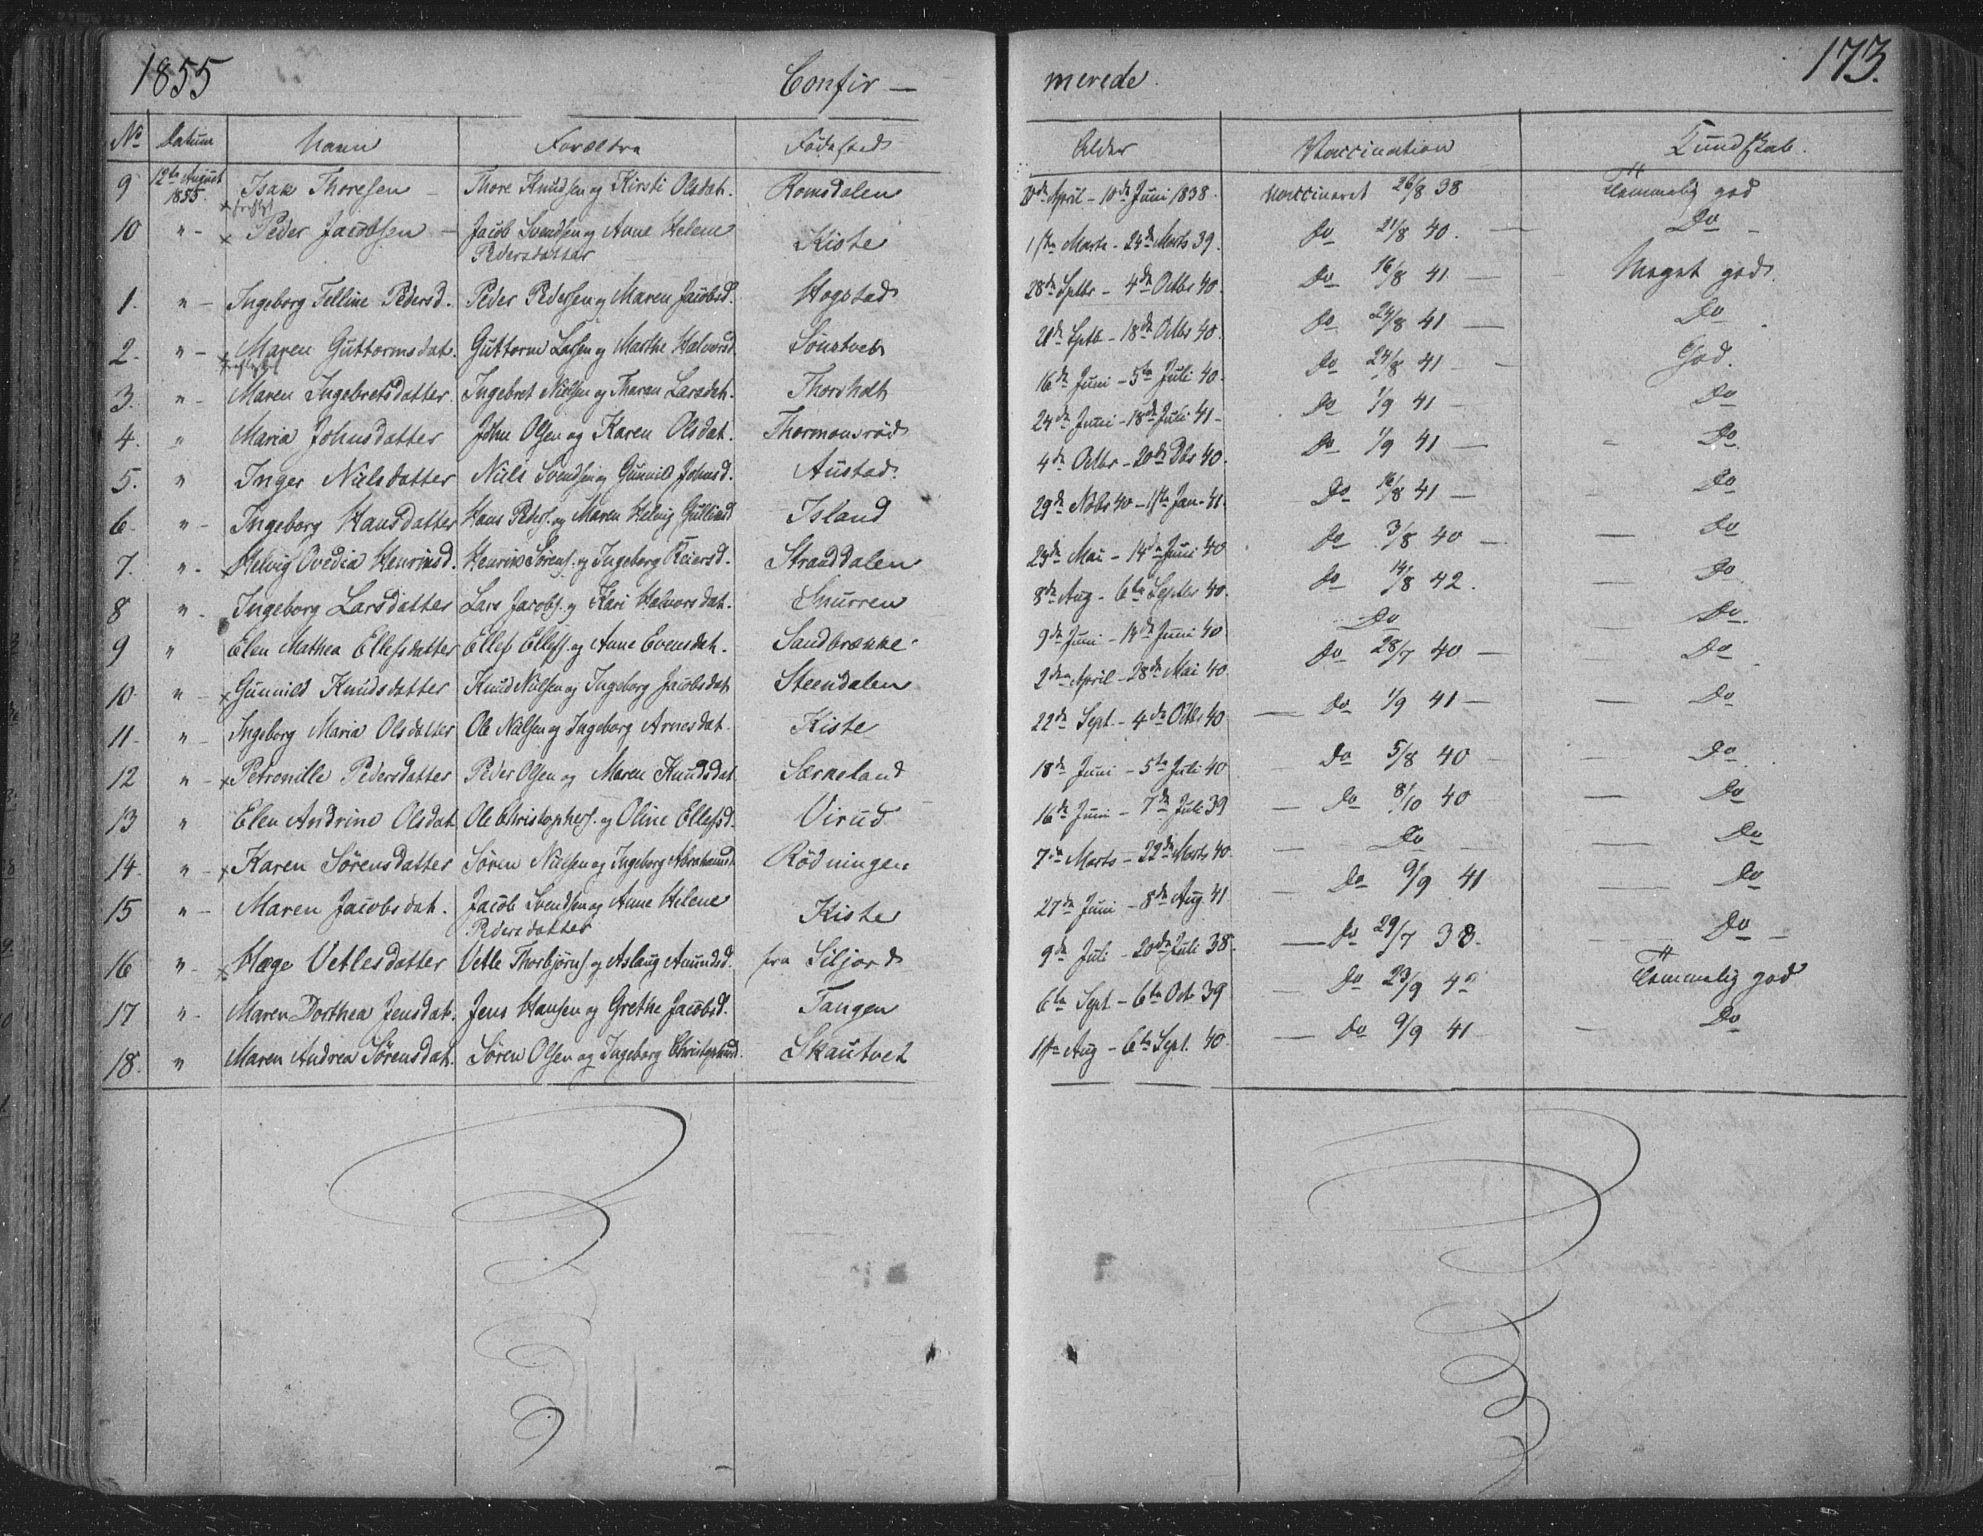 SAKO, Siljan kirkebøker, F/Fa/L0001: Parish register (official) no. 1, 1831-1870, p. 173